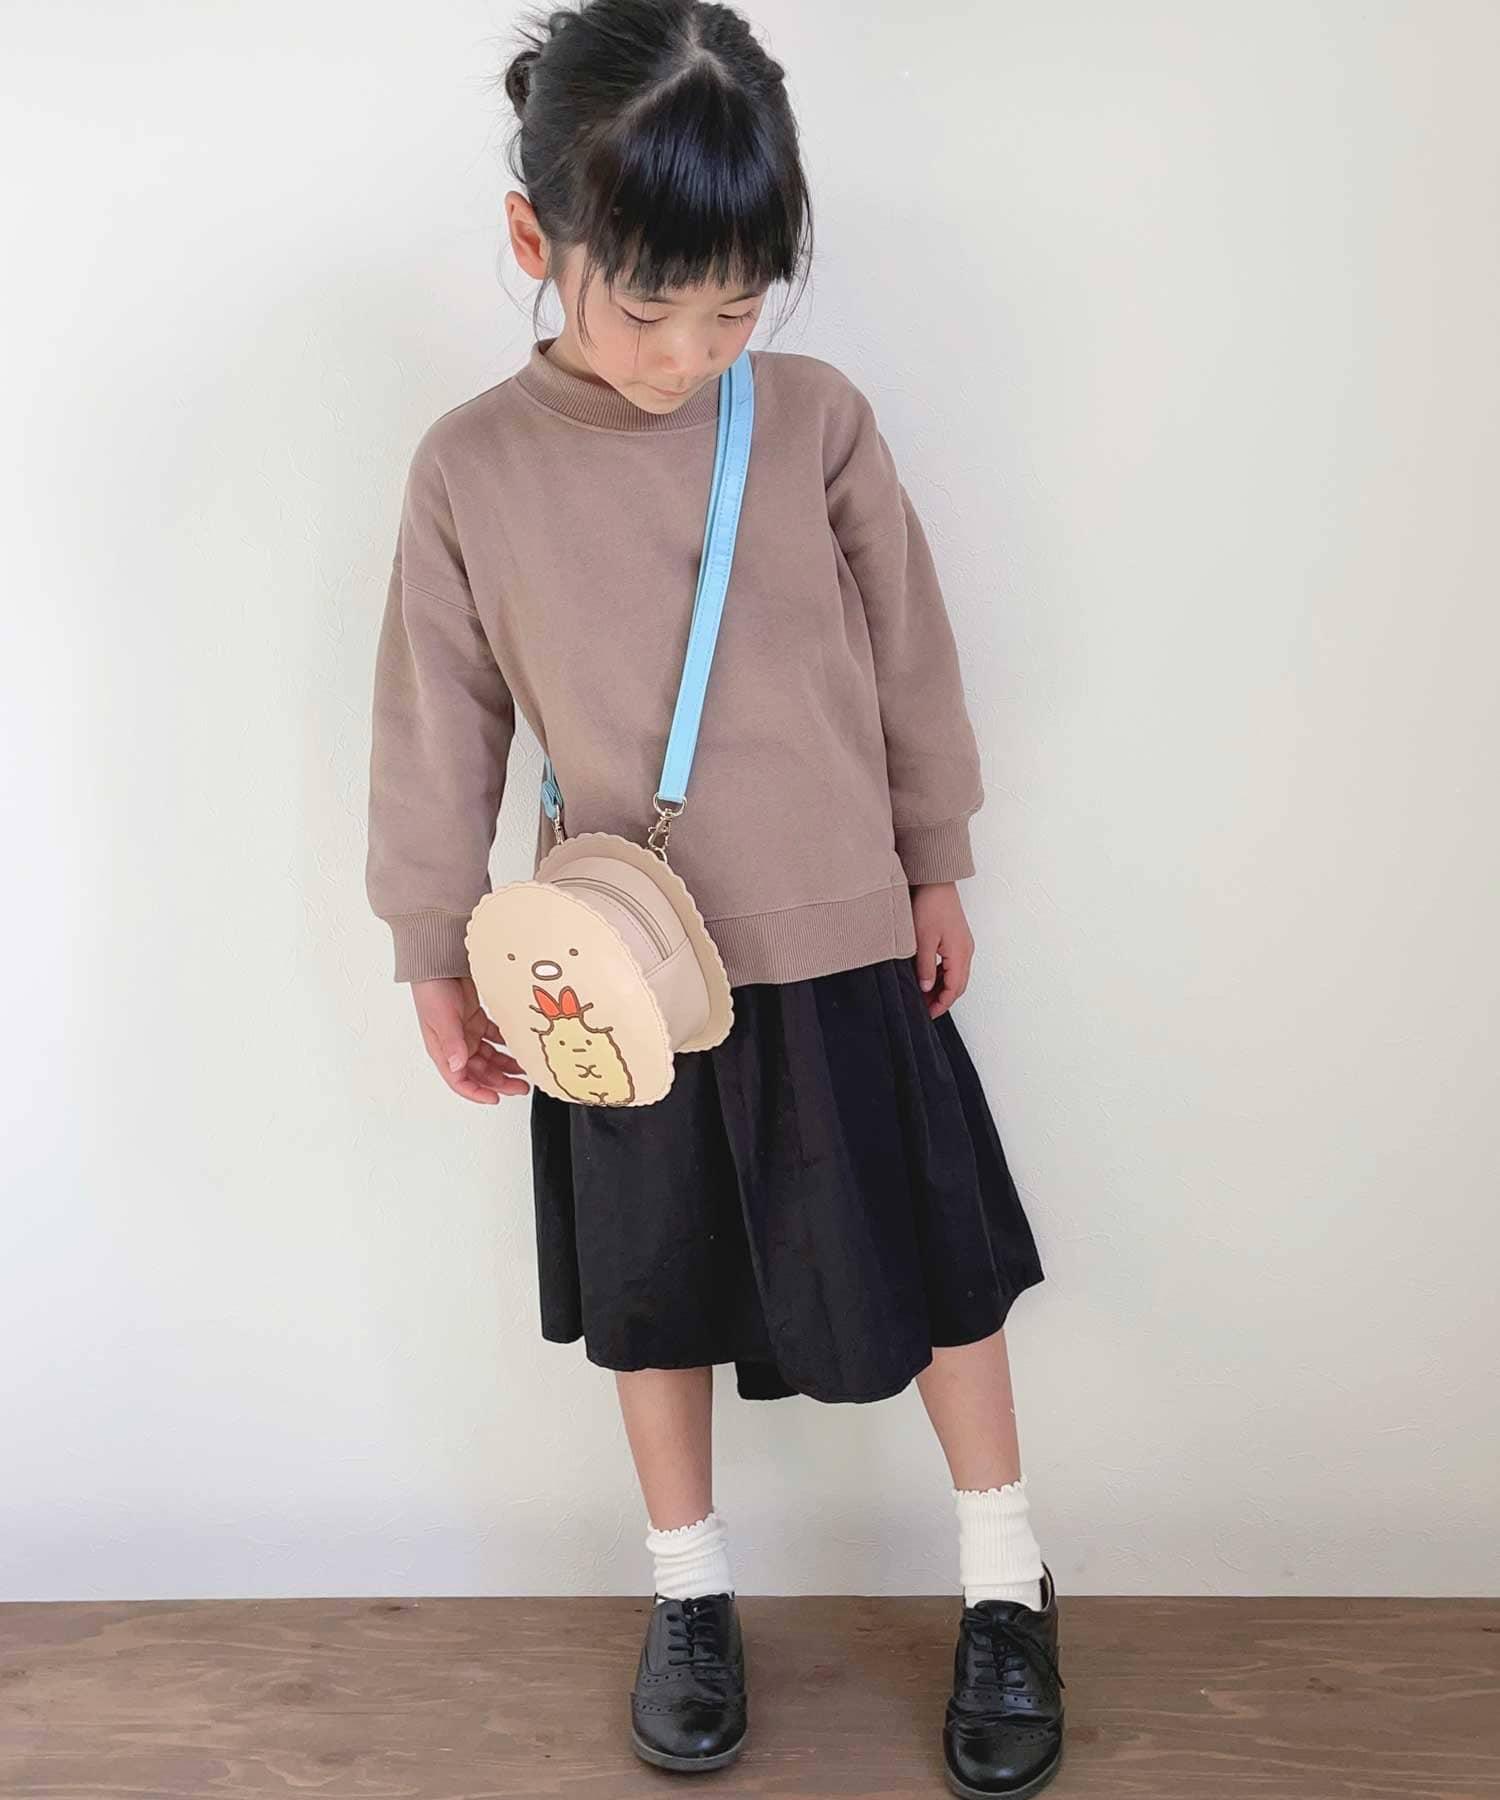 CIAOPANIC TYPY(チャオパニックティピー) 【KIDS】【すみっコぐらし】PUダイカット ミニショルダー